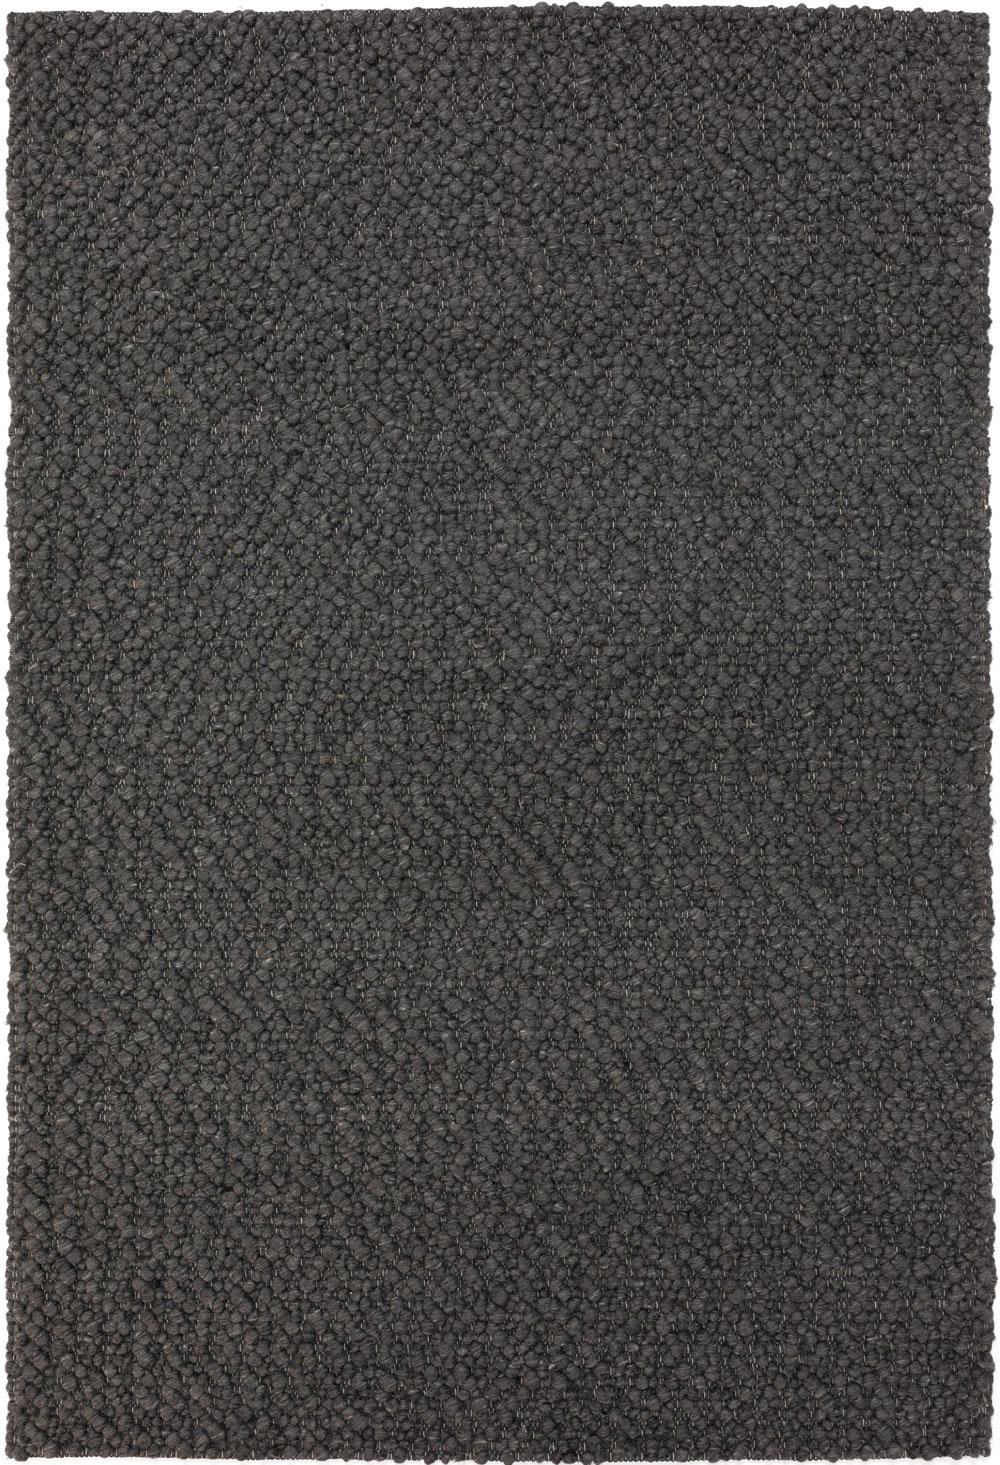 Dalyn Gorbea GR1 Charcoal Rug